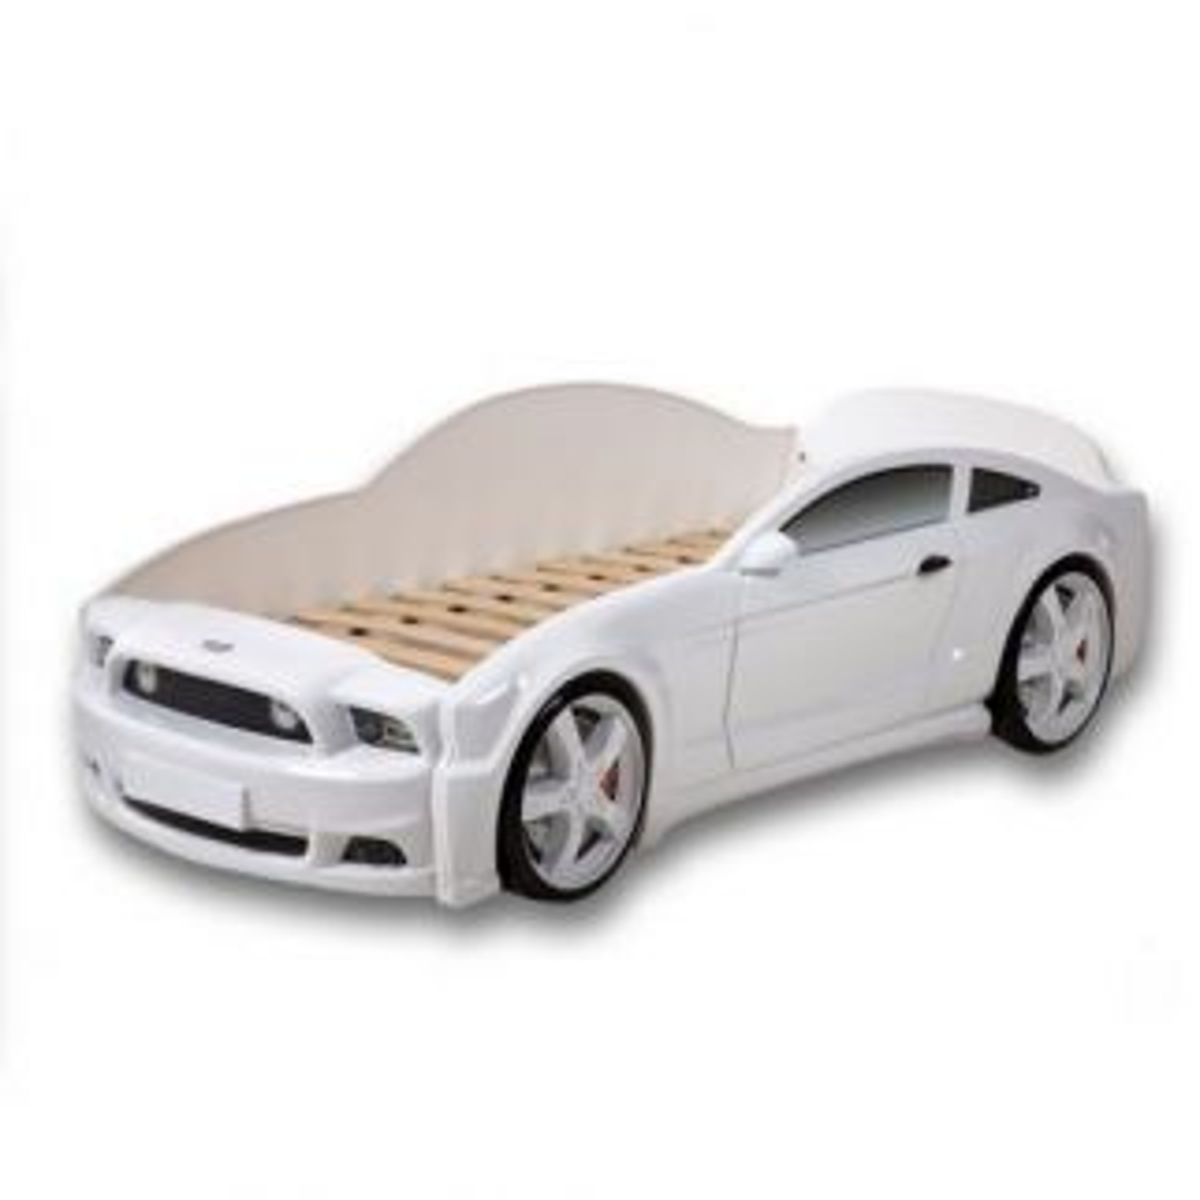 Łóżko LIGHT 3D 160x70 białe samochód